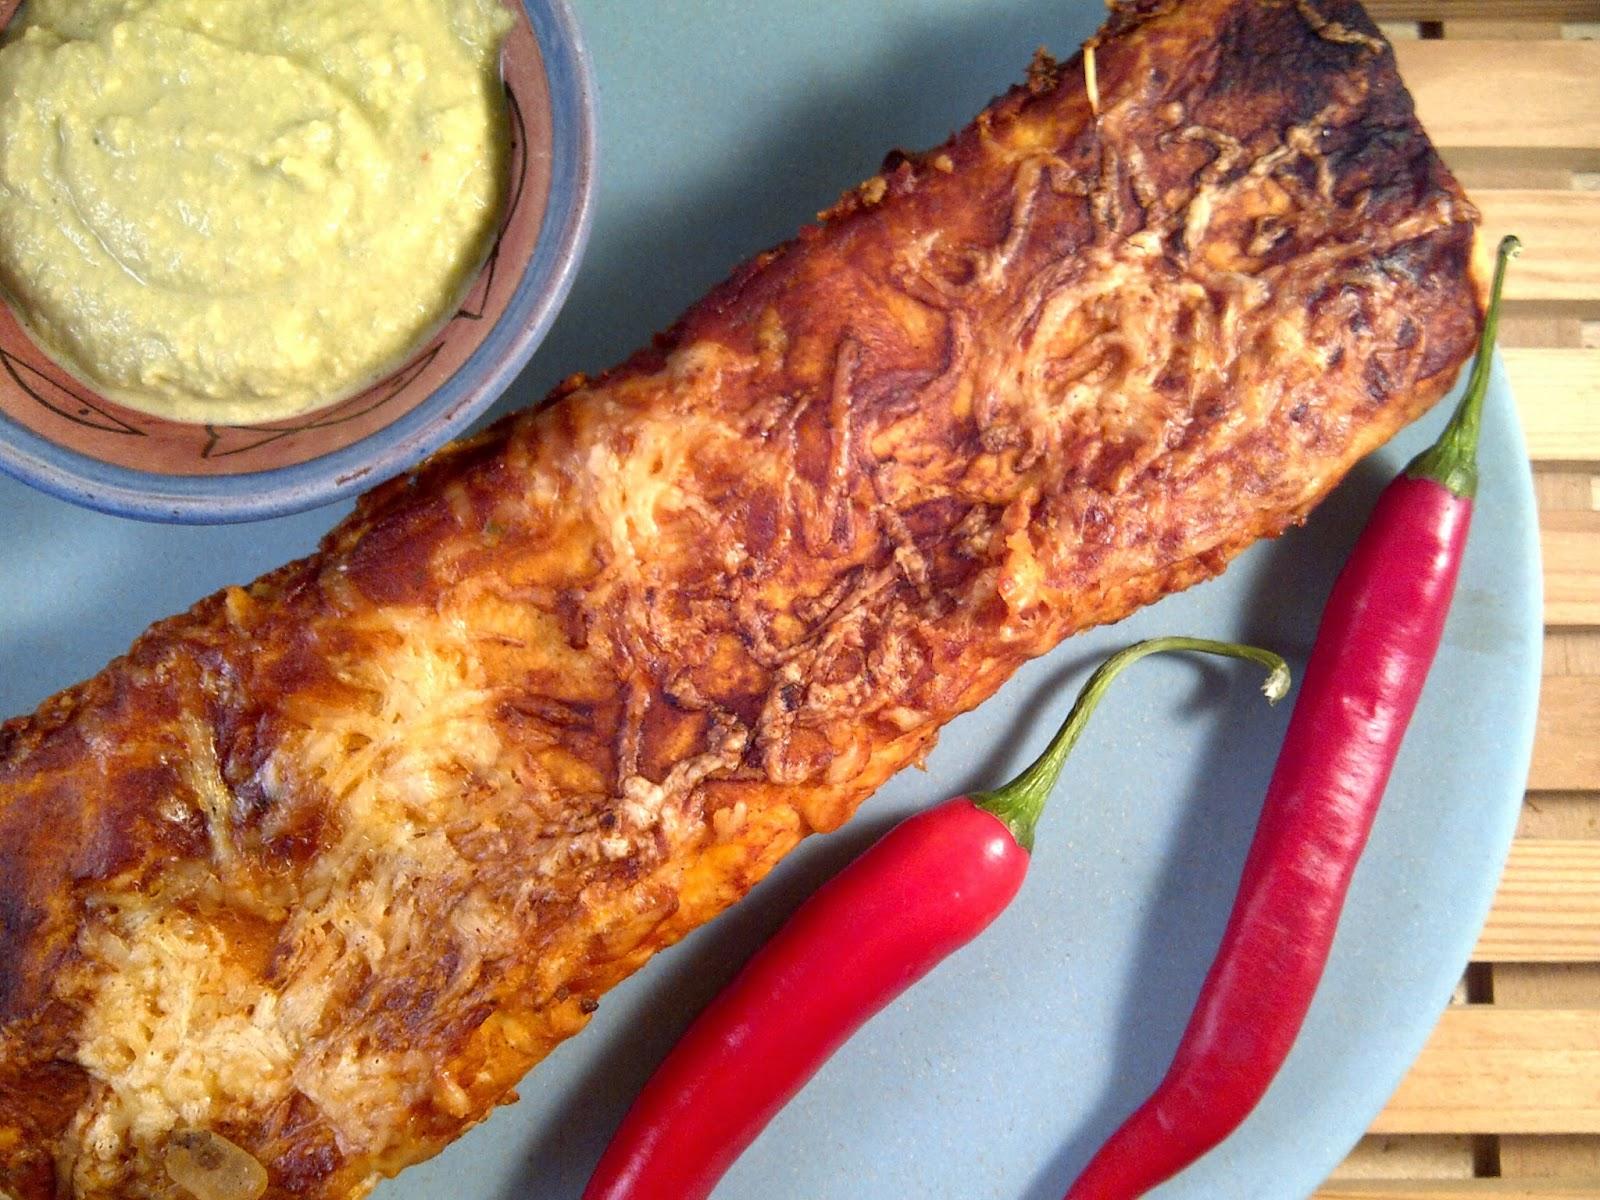 Pittige rundvlees enchilada met guacamole   oesters & uien